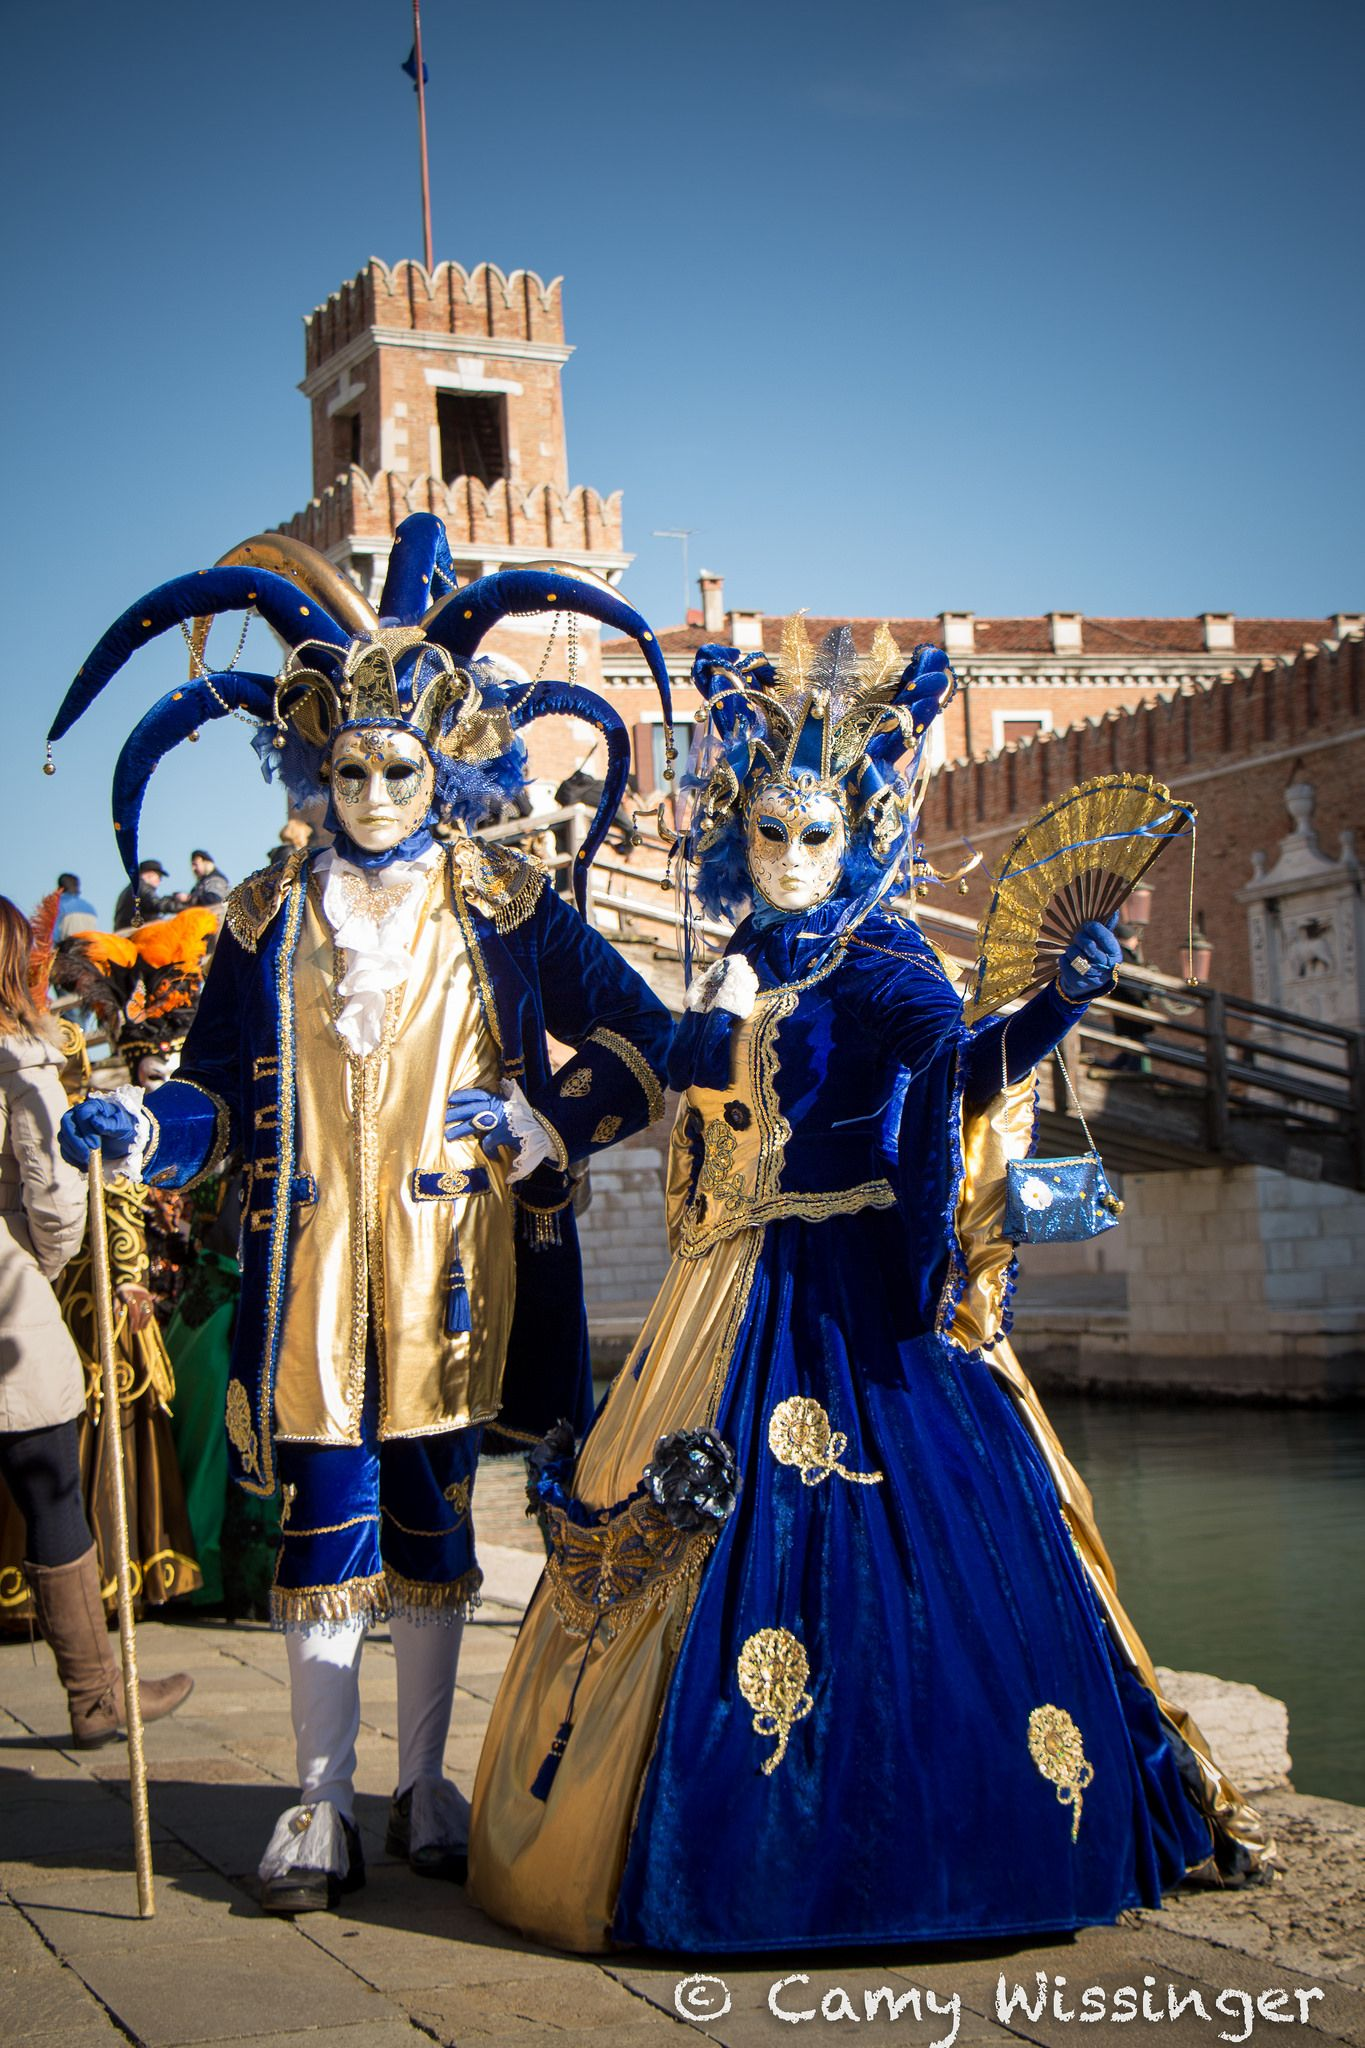 carnevale di venezia | Venice carnival costumes, Carnival ...